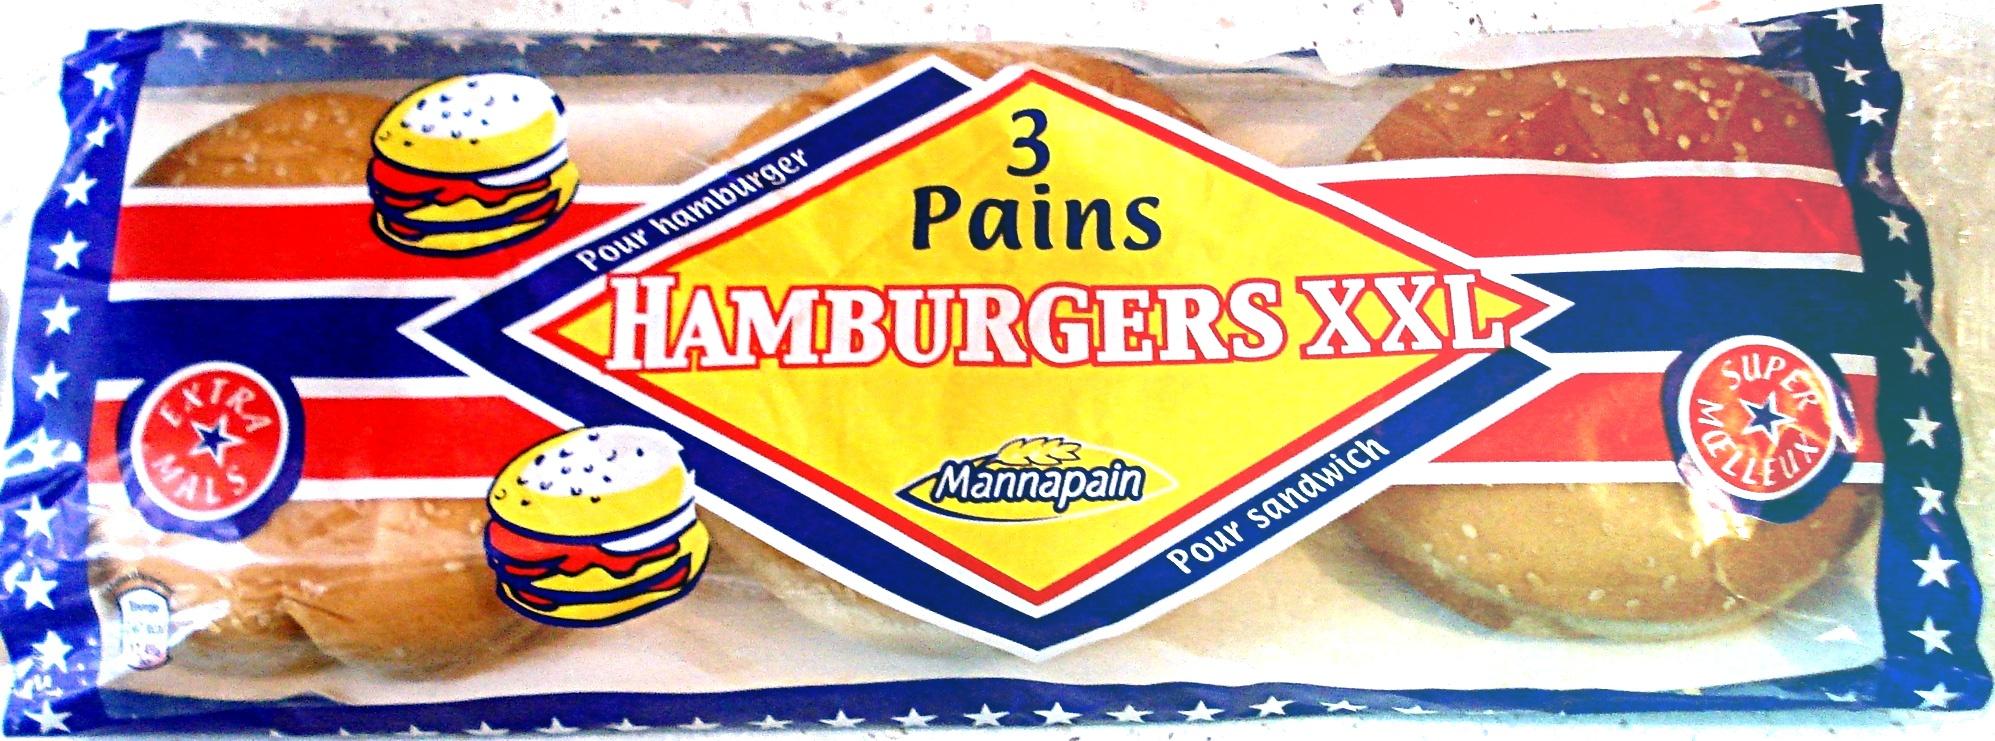 Pains Hamburgers XXL - Product